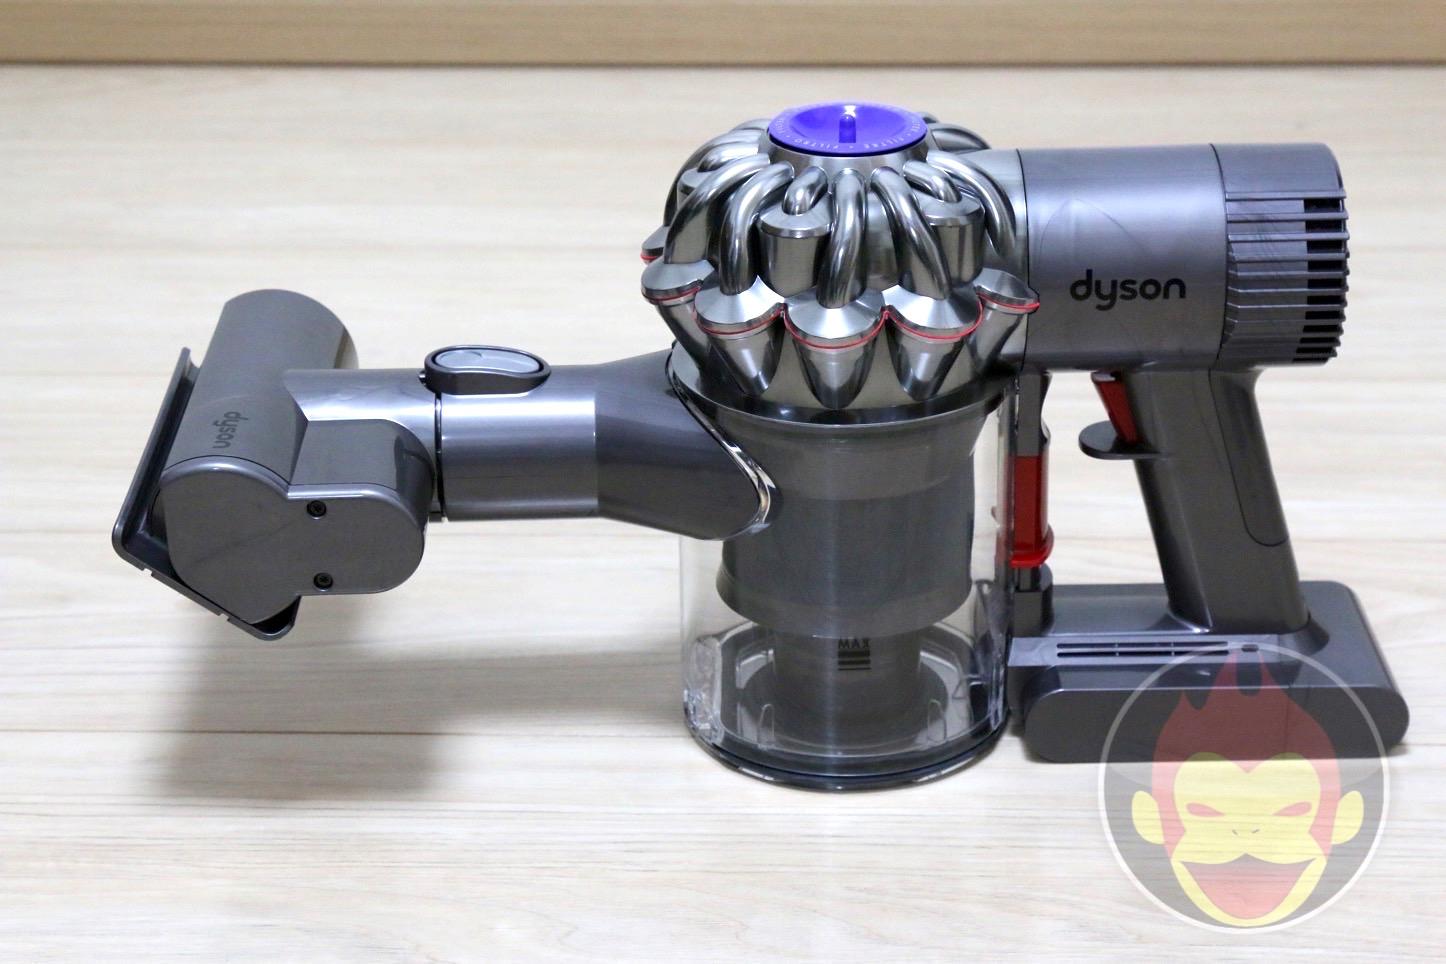 Dyson-DC62-64.JPG